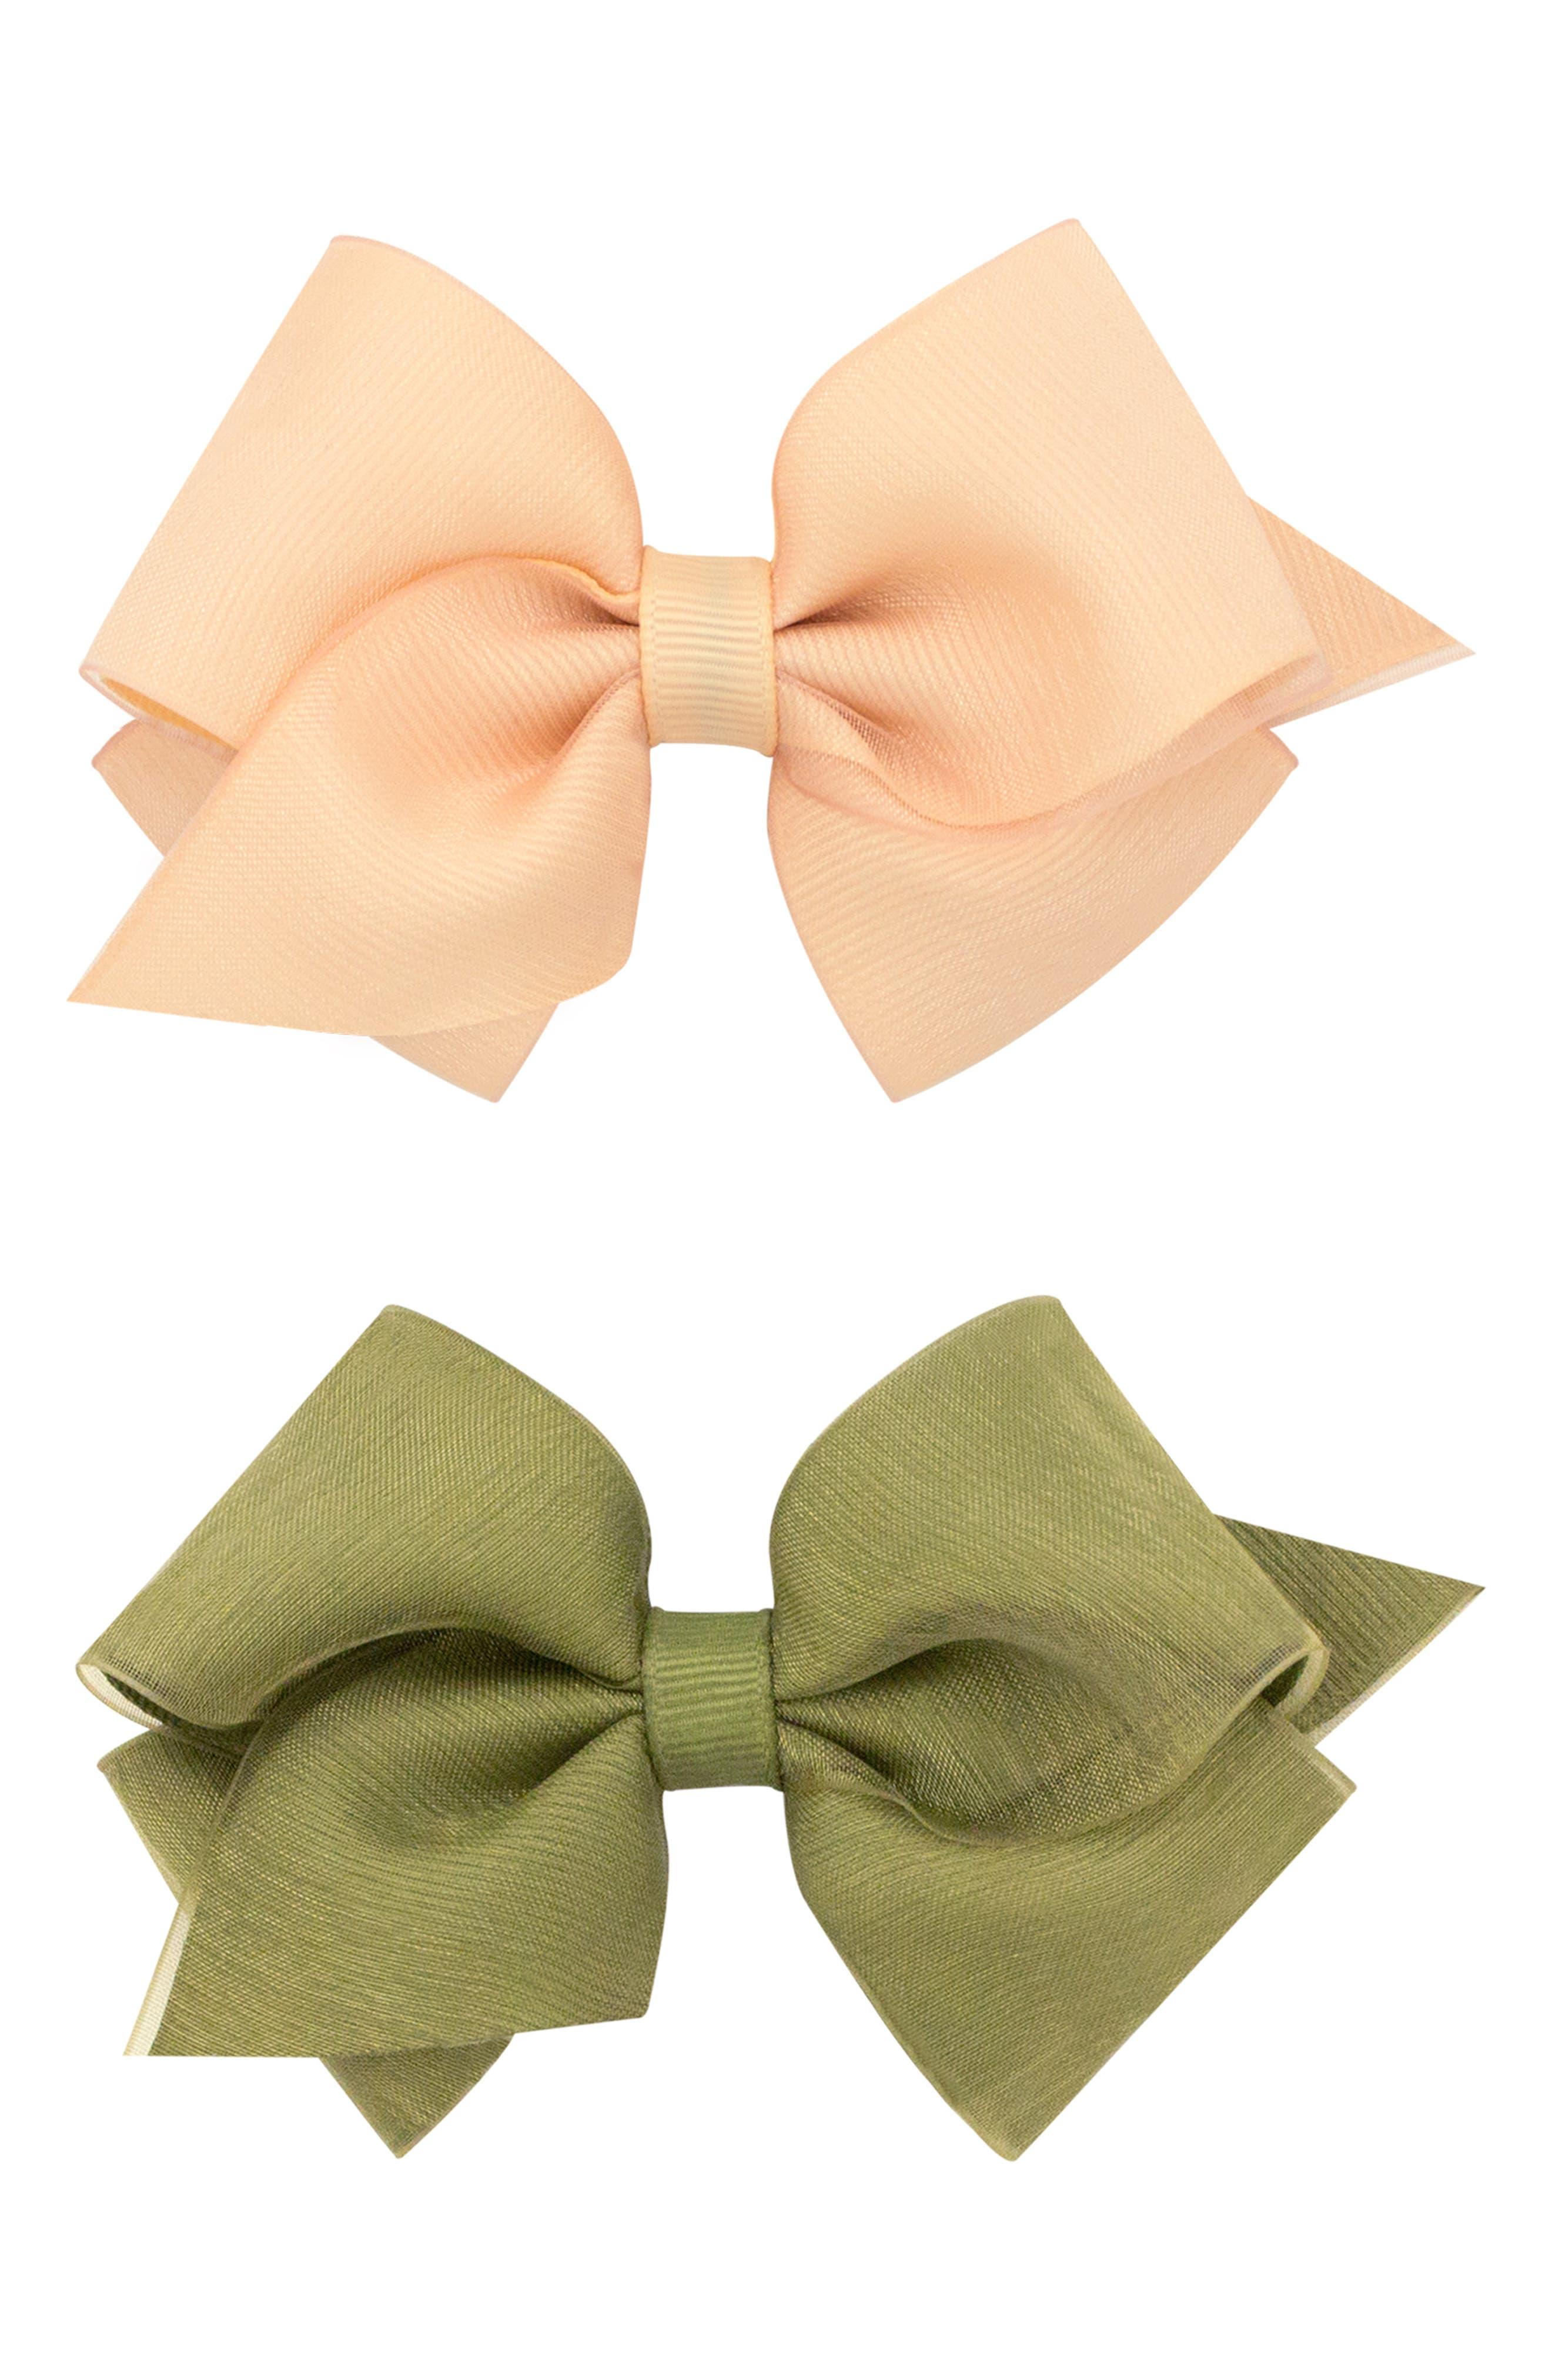 PLH BOWS, 2-Pack Organza Bow Hair Clips, Alternate thumbnail 2, color, 250